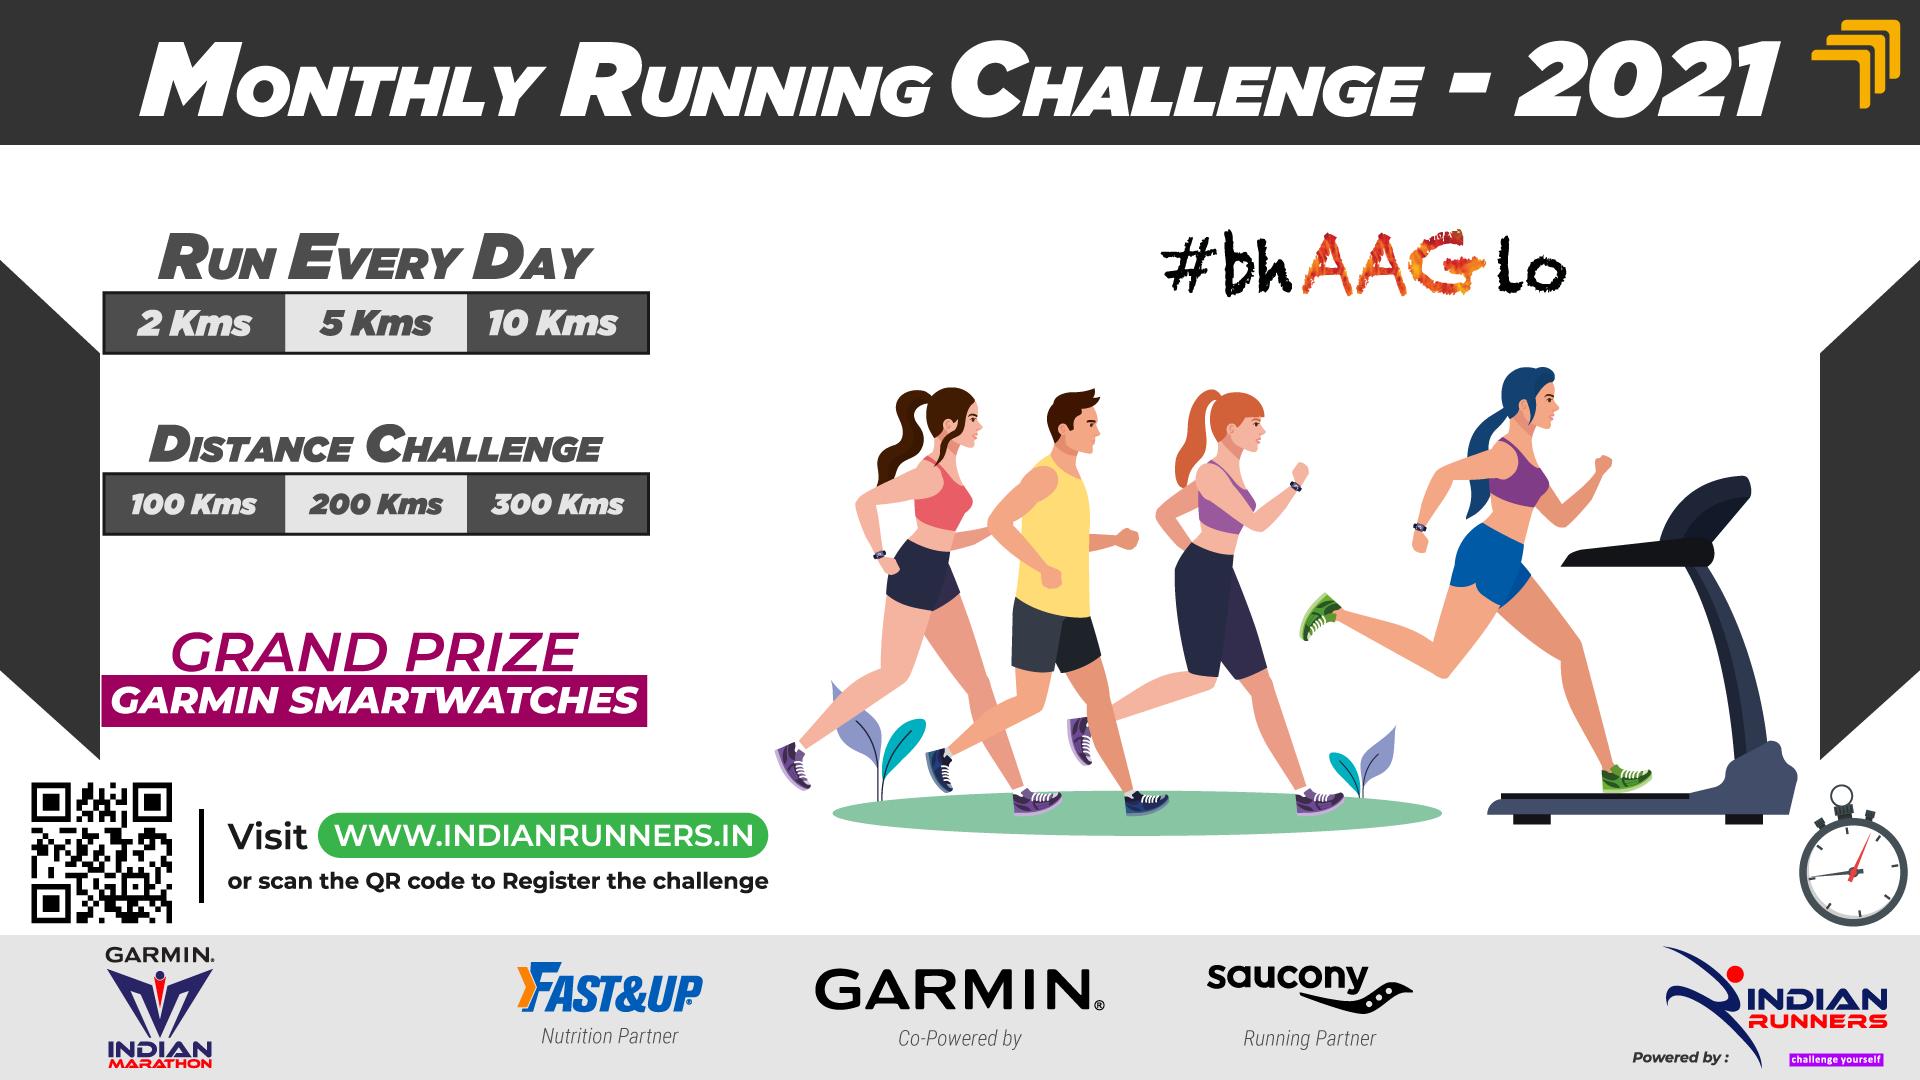 Monthly Running Challenge image